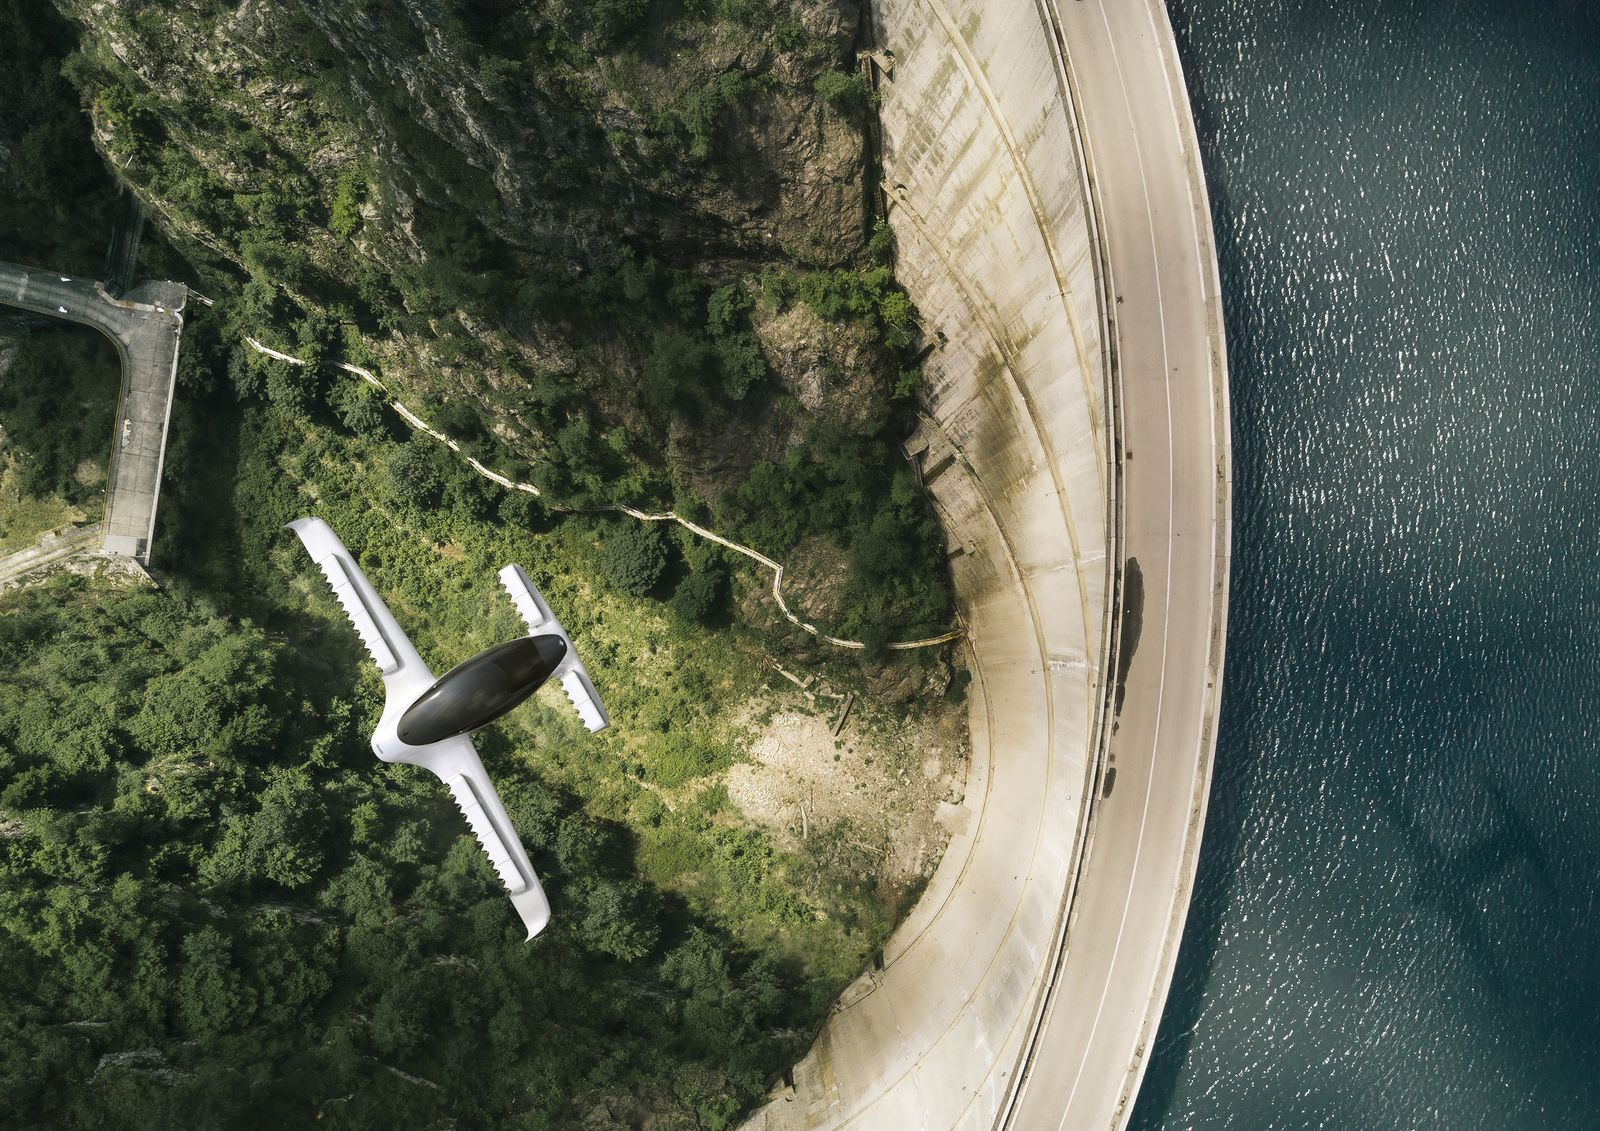 Flugtaxis/ Lilium Jet